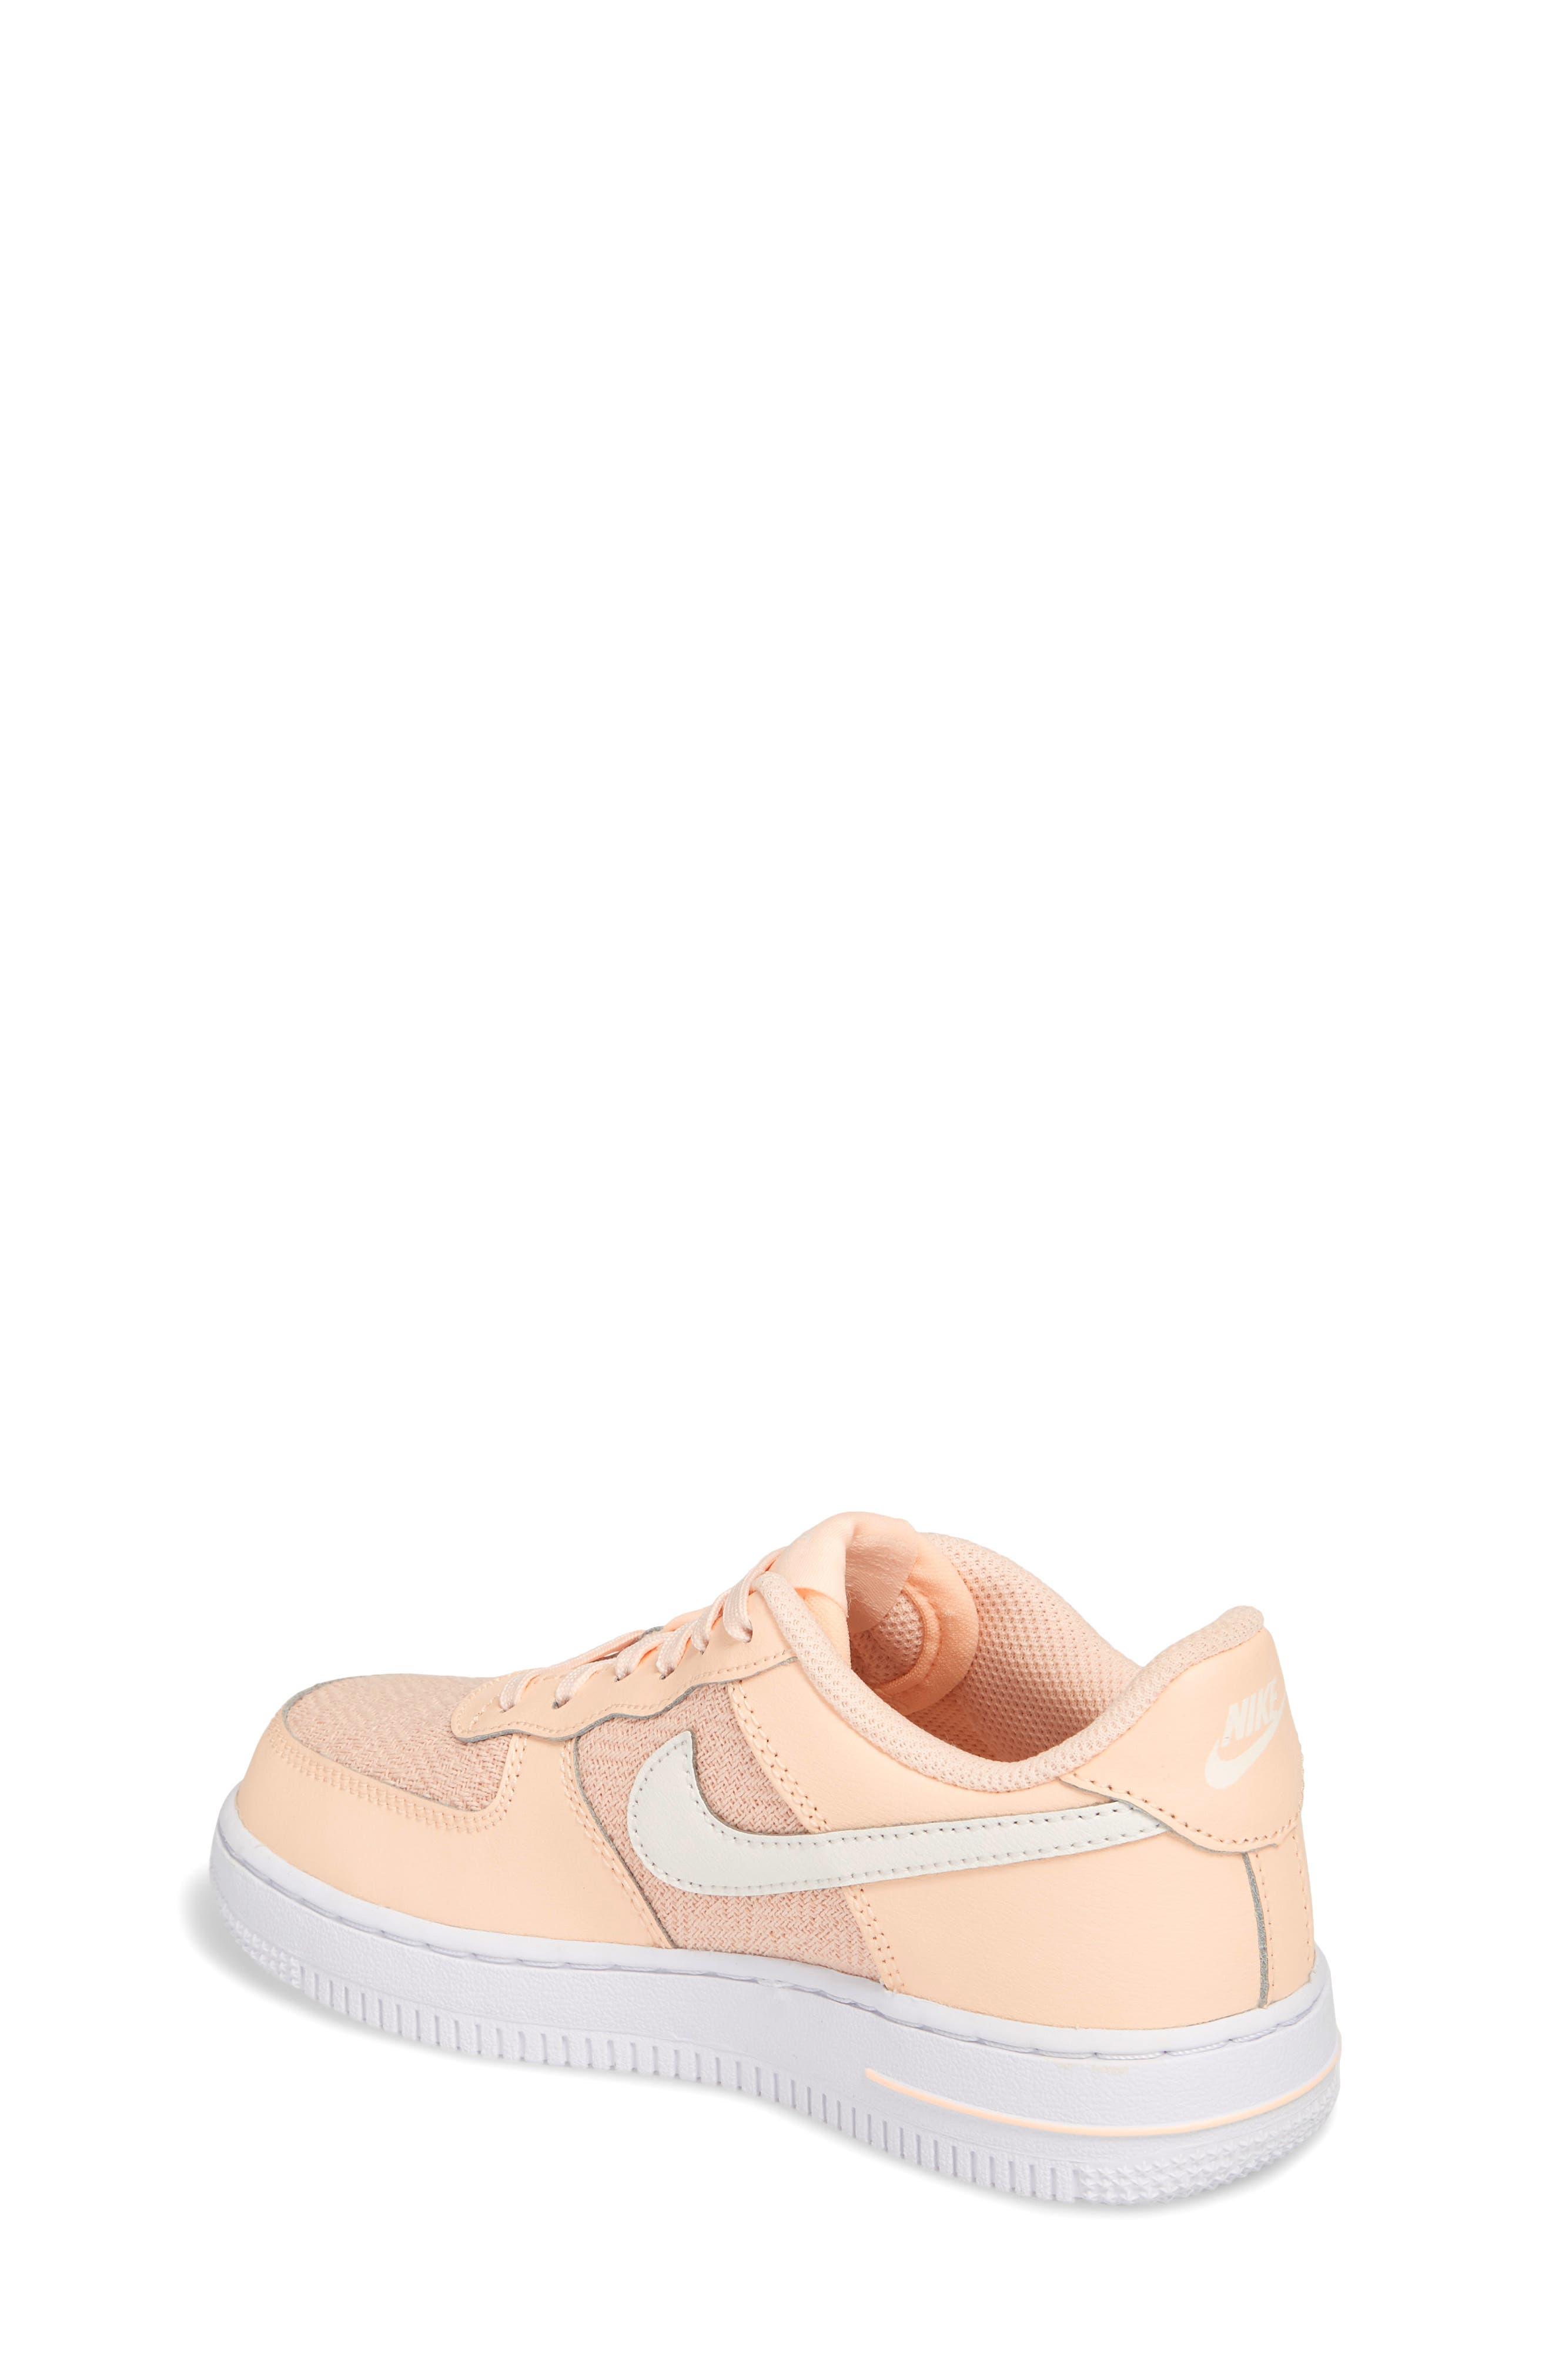 Air Force 1 LV8 Sneaker,                             Alternate thumbnail 2, color,                             Crimson Tint/ Sail/ White